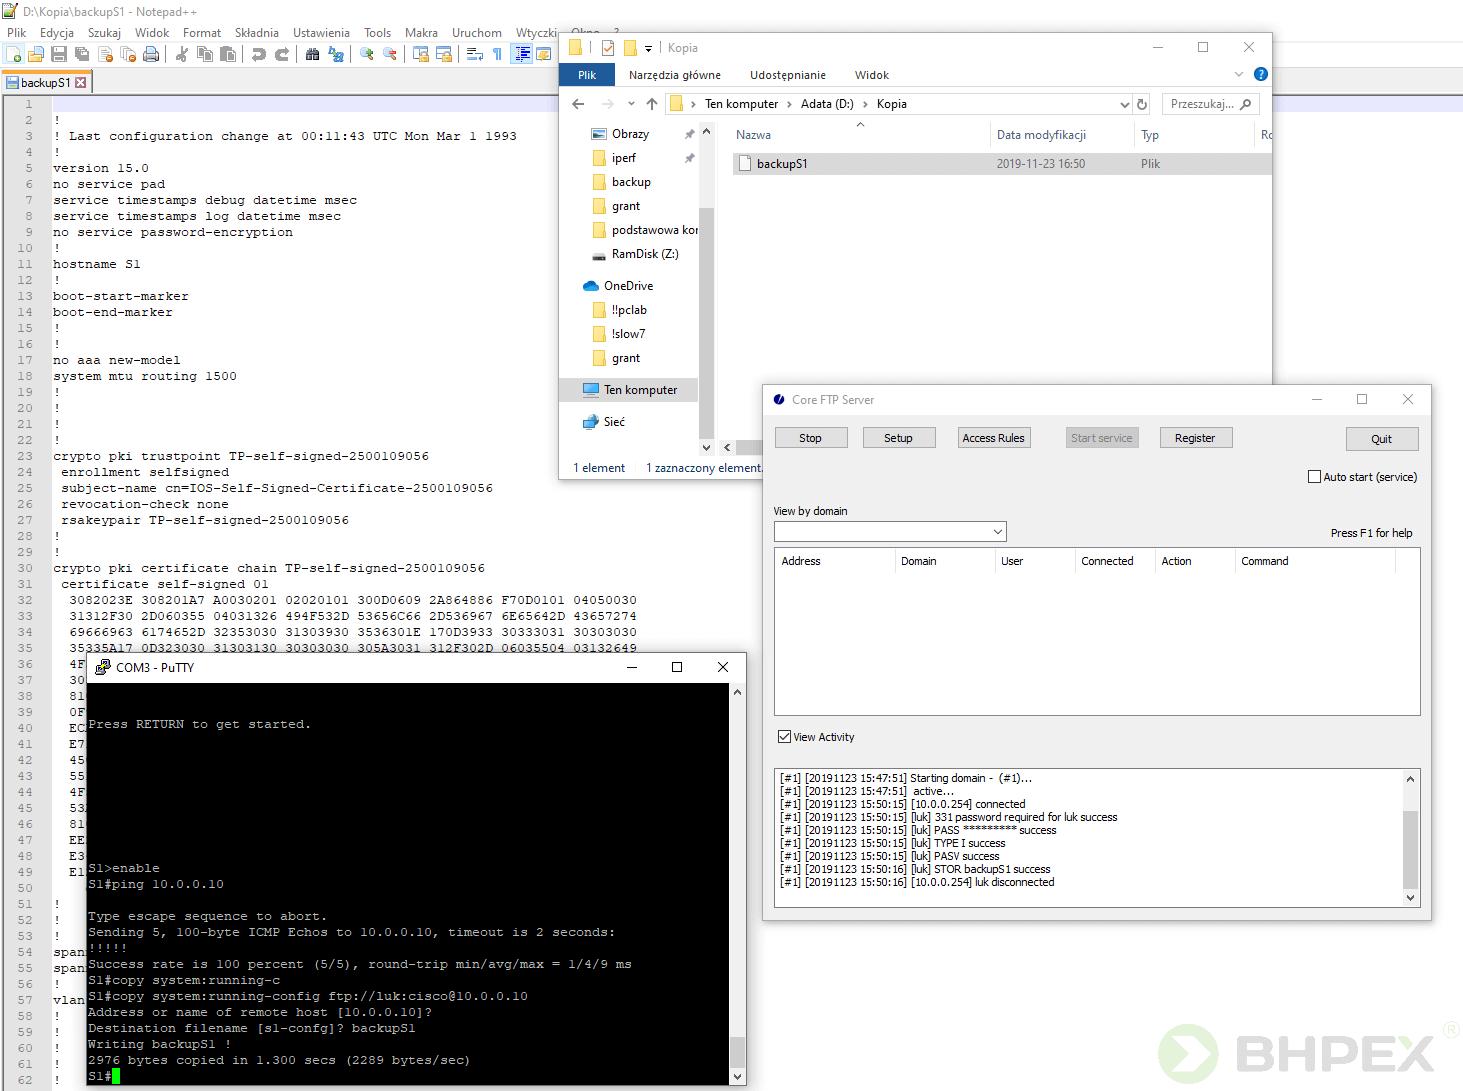 kopia izapis ustawień dopliku backupS1